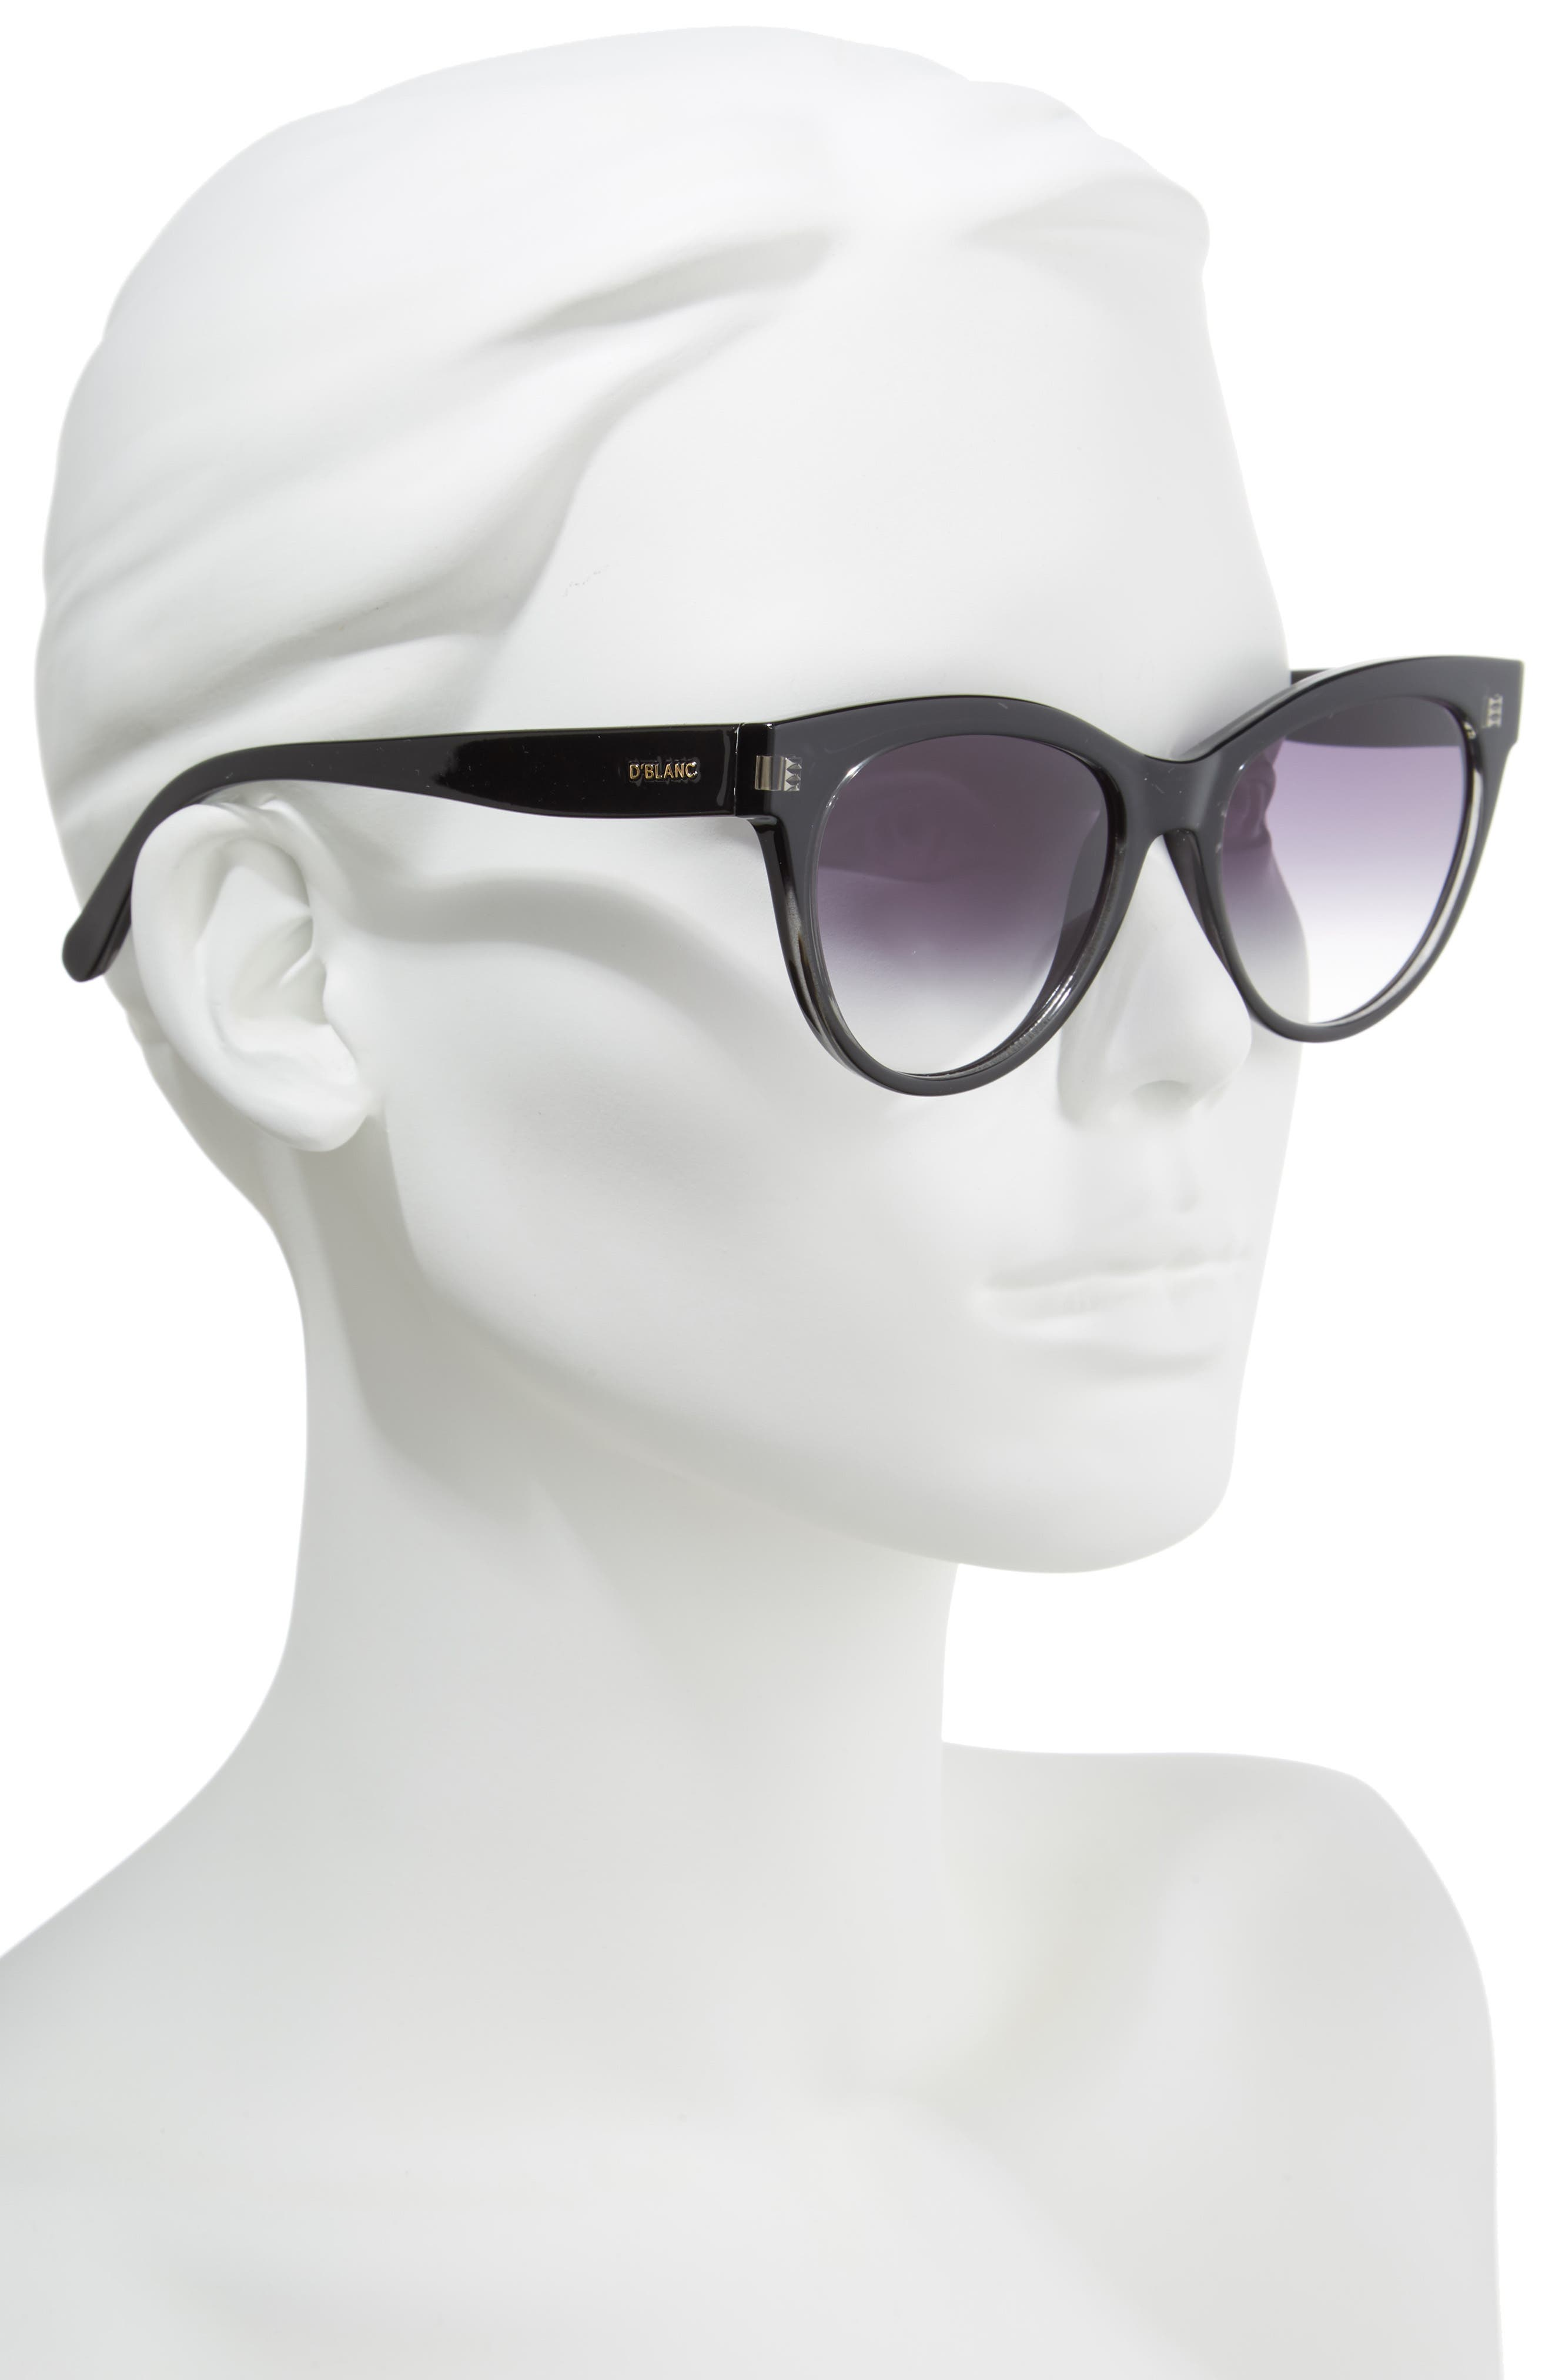 D'BLANC Felicity 54mm Cat Eye Sunglasses,                             Alternate thumbnail 2, color,                             001